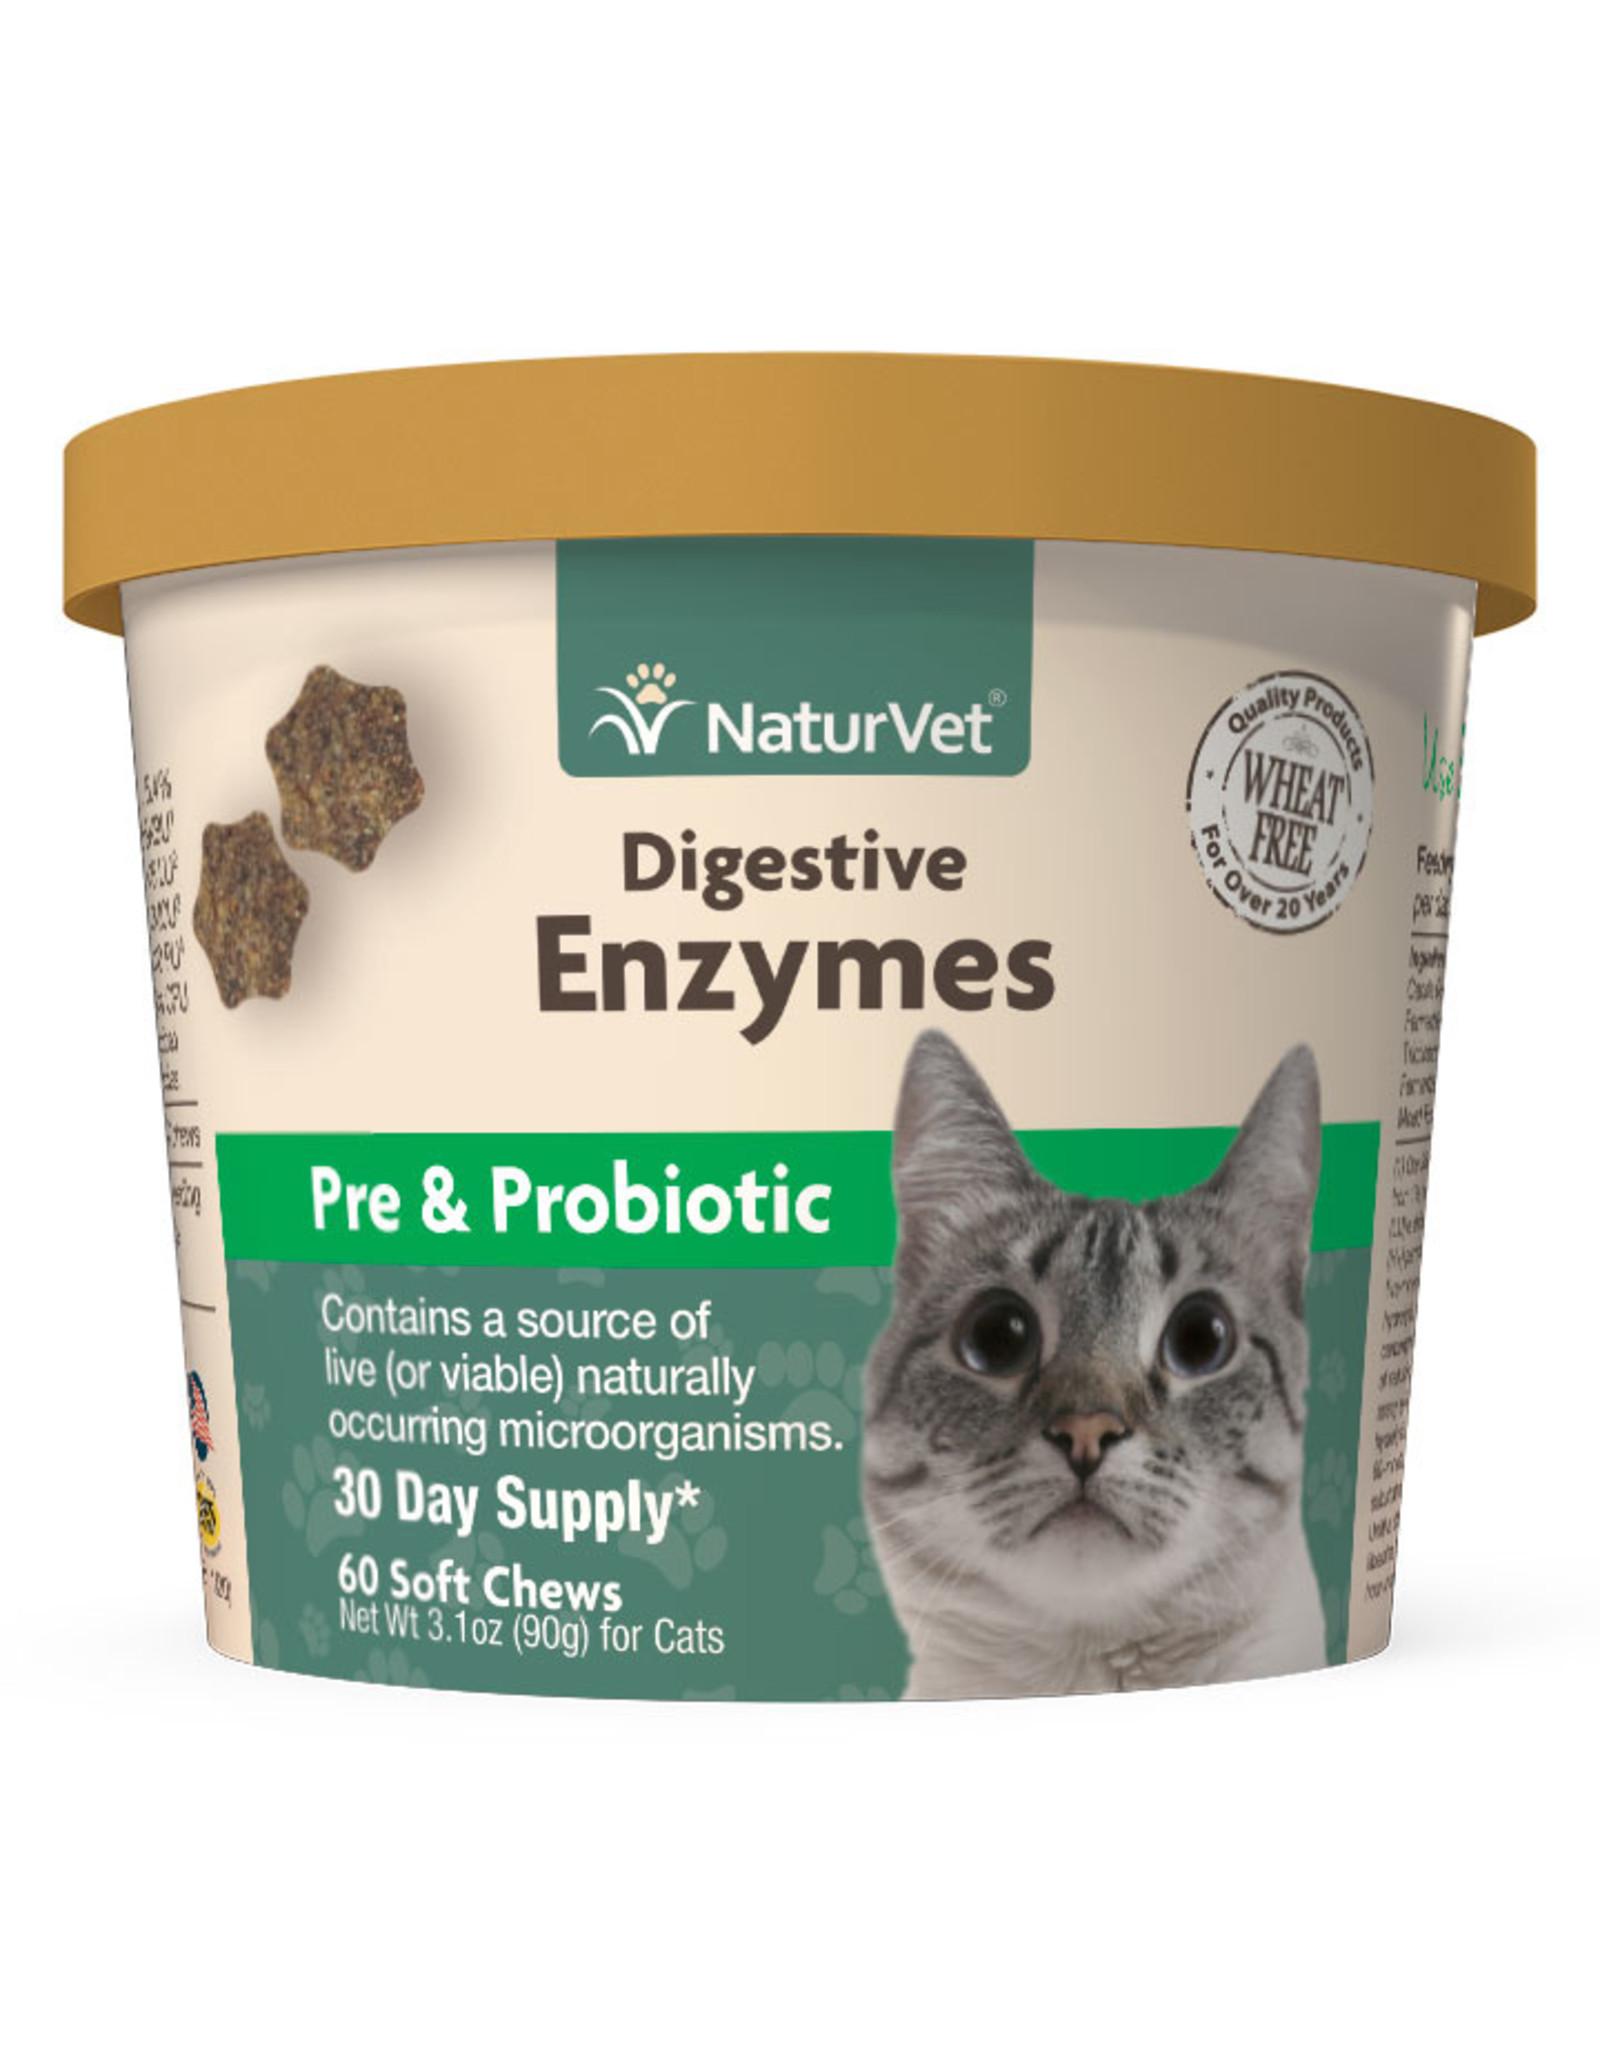 naturVet NaturVet Cat Digestive Enzymes + Pre & Probiotics 60 Soft Chews